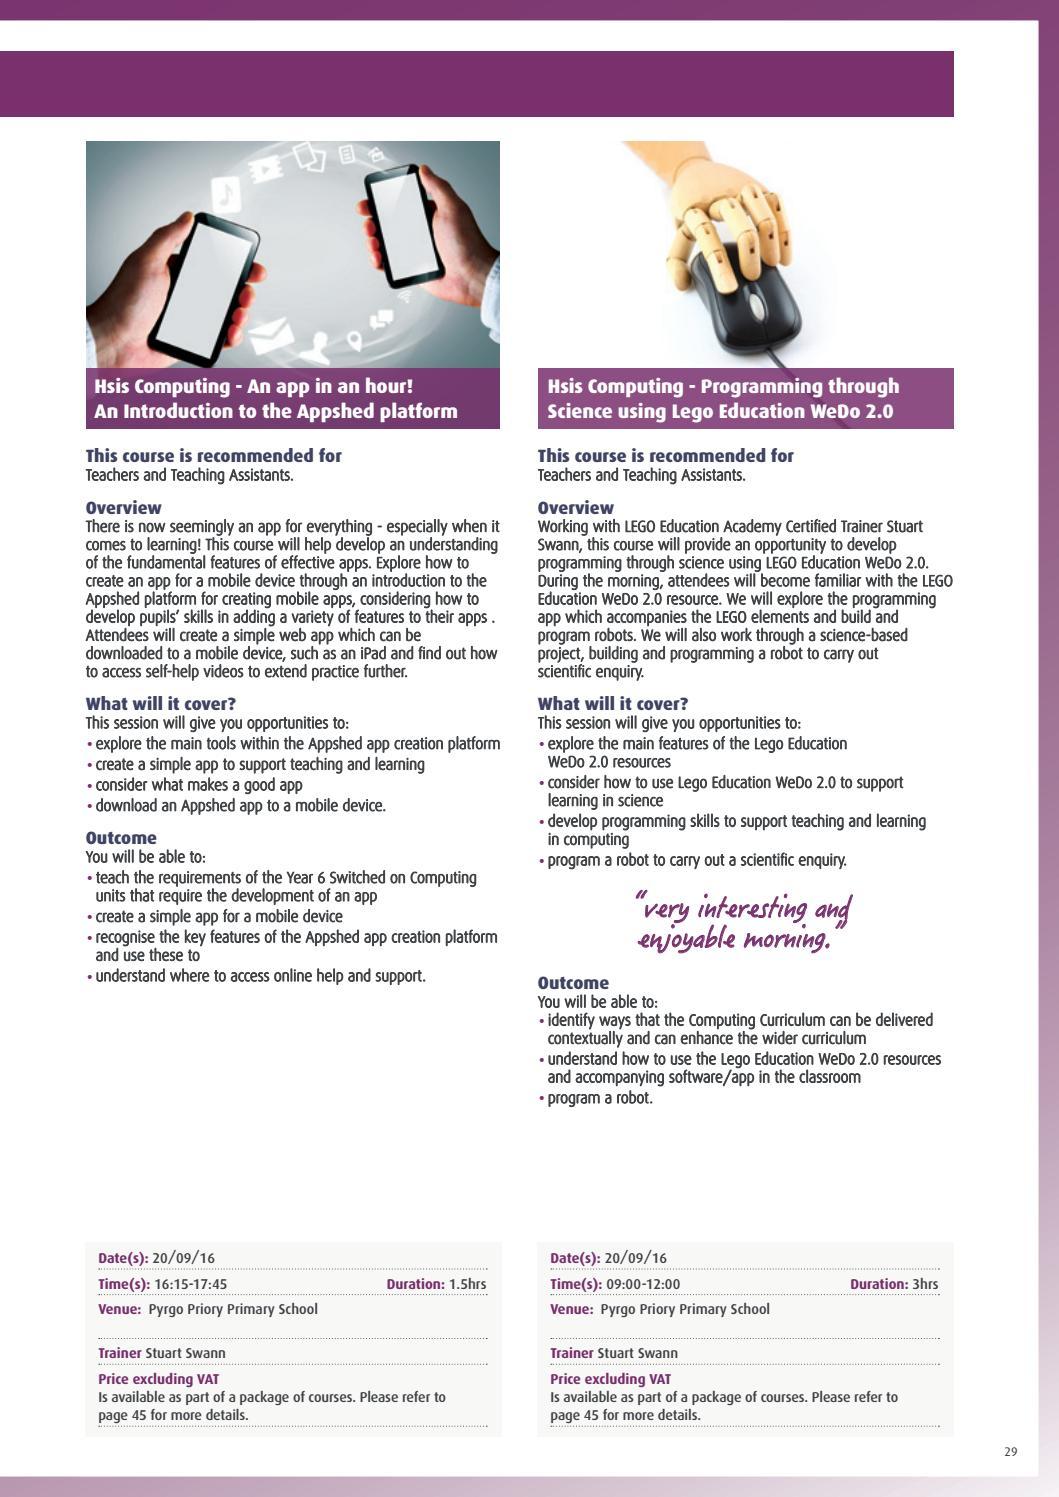 Havering Educational Services Training & Development